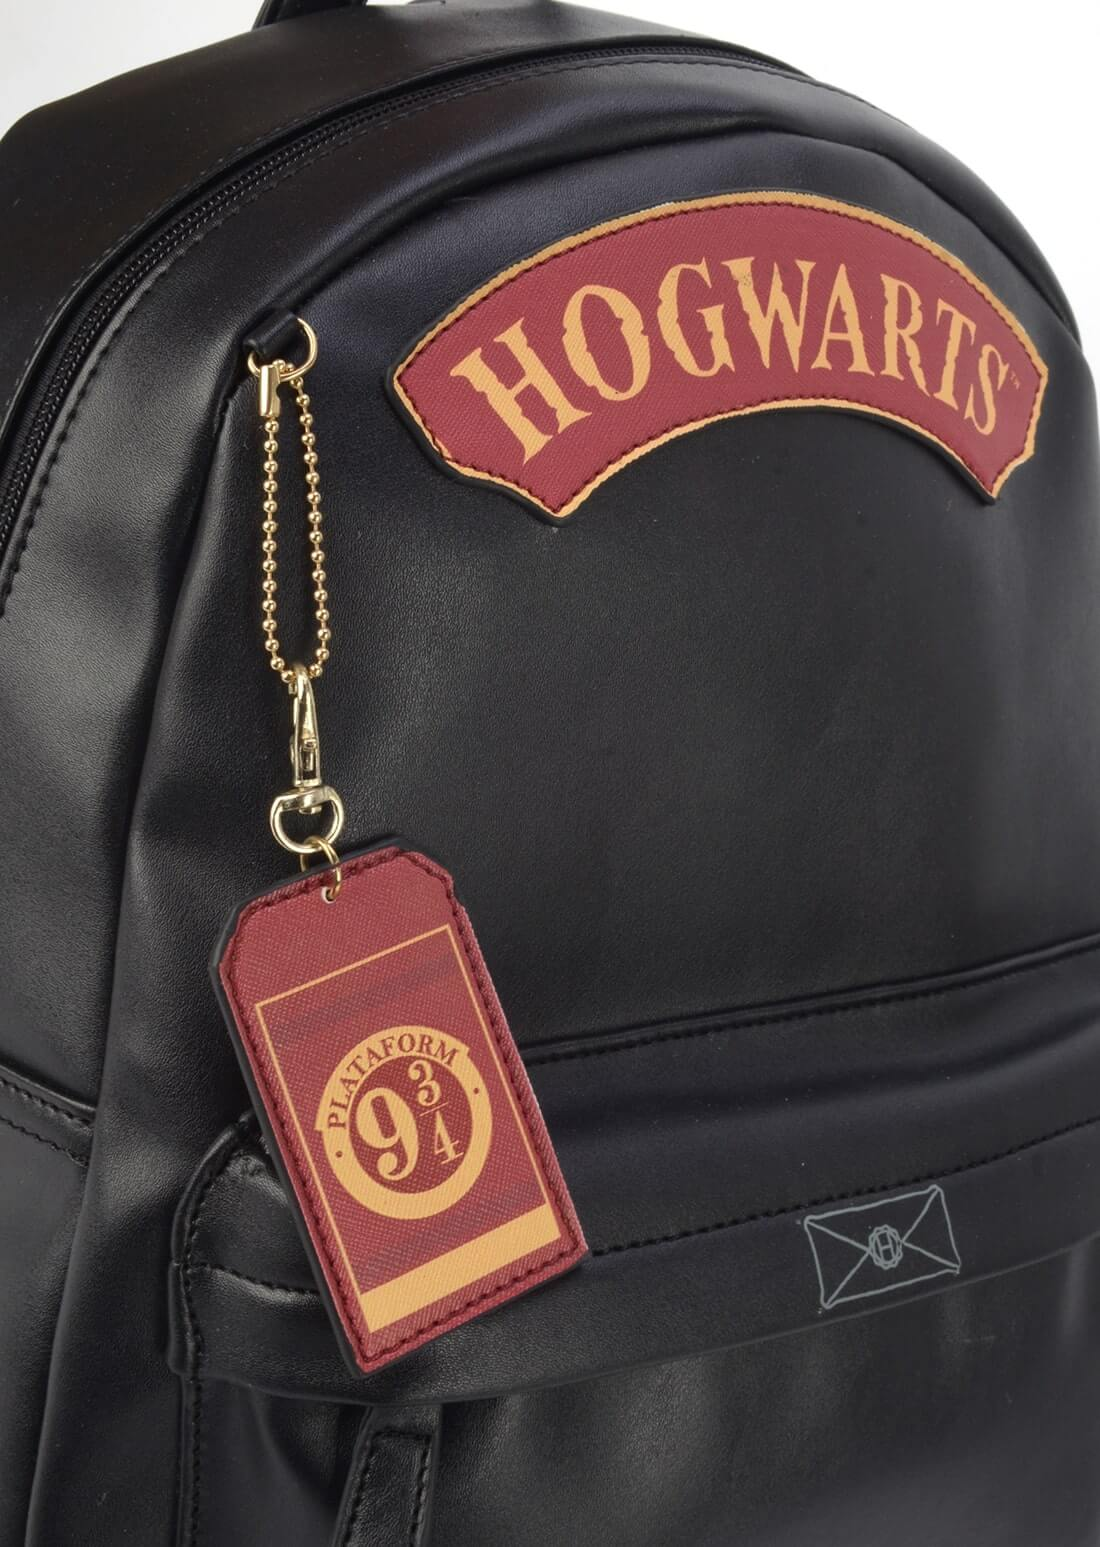 Bolsa Mochila Harry Potter Hogwarts 9 3/4 Couro Sintético